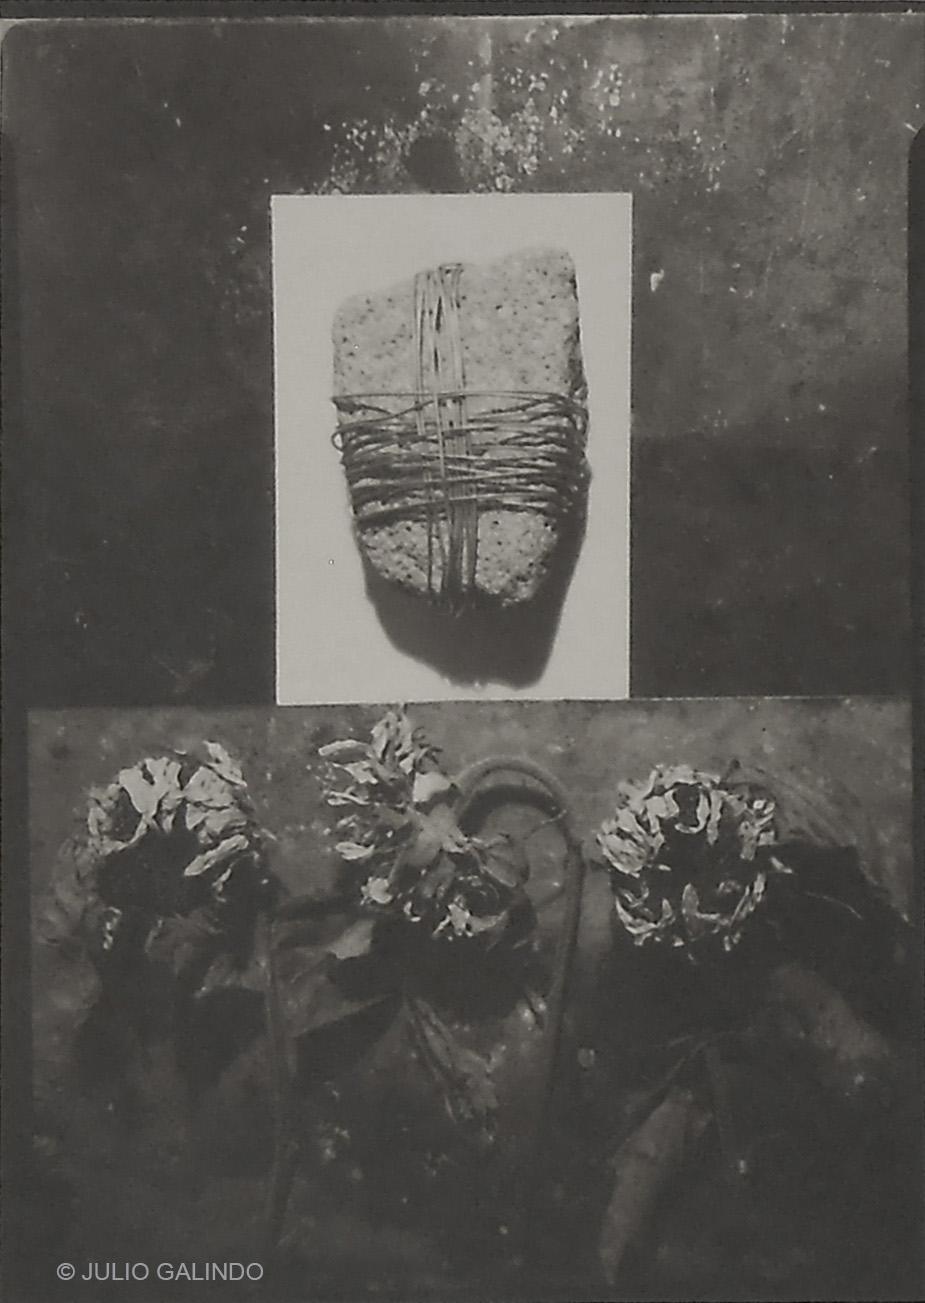 Piedras I, 1993. © Julio Galindo